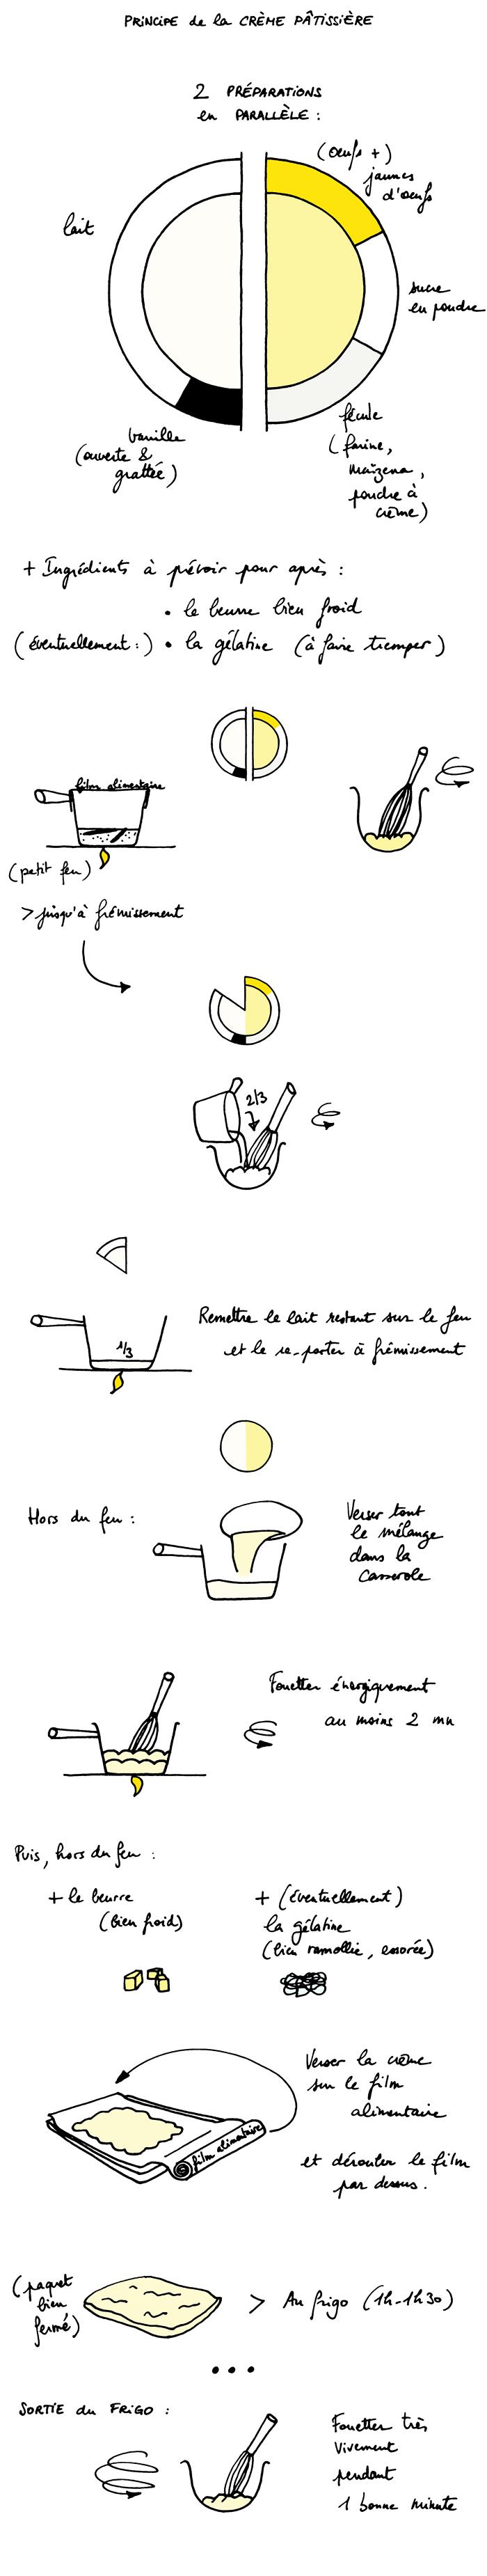 Crème_pâtissière_principe_700B